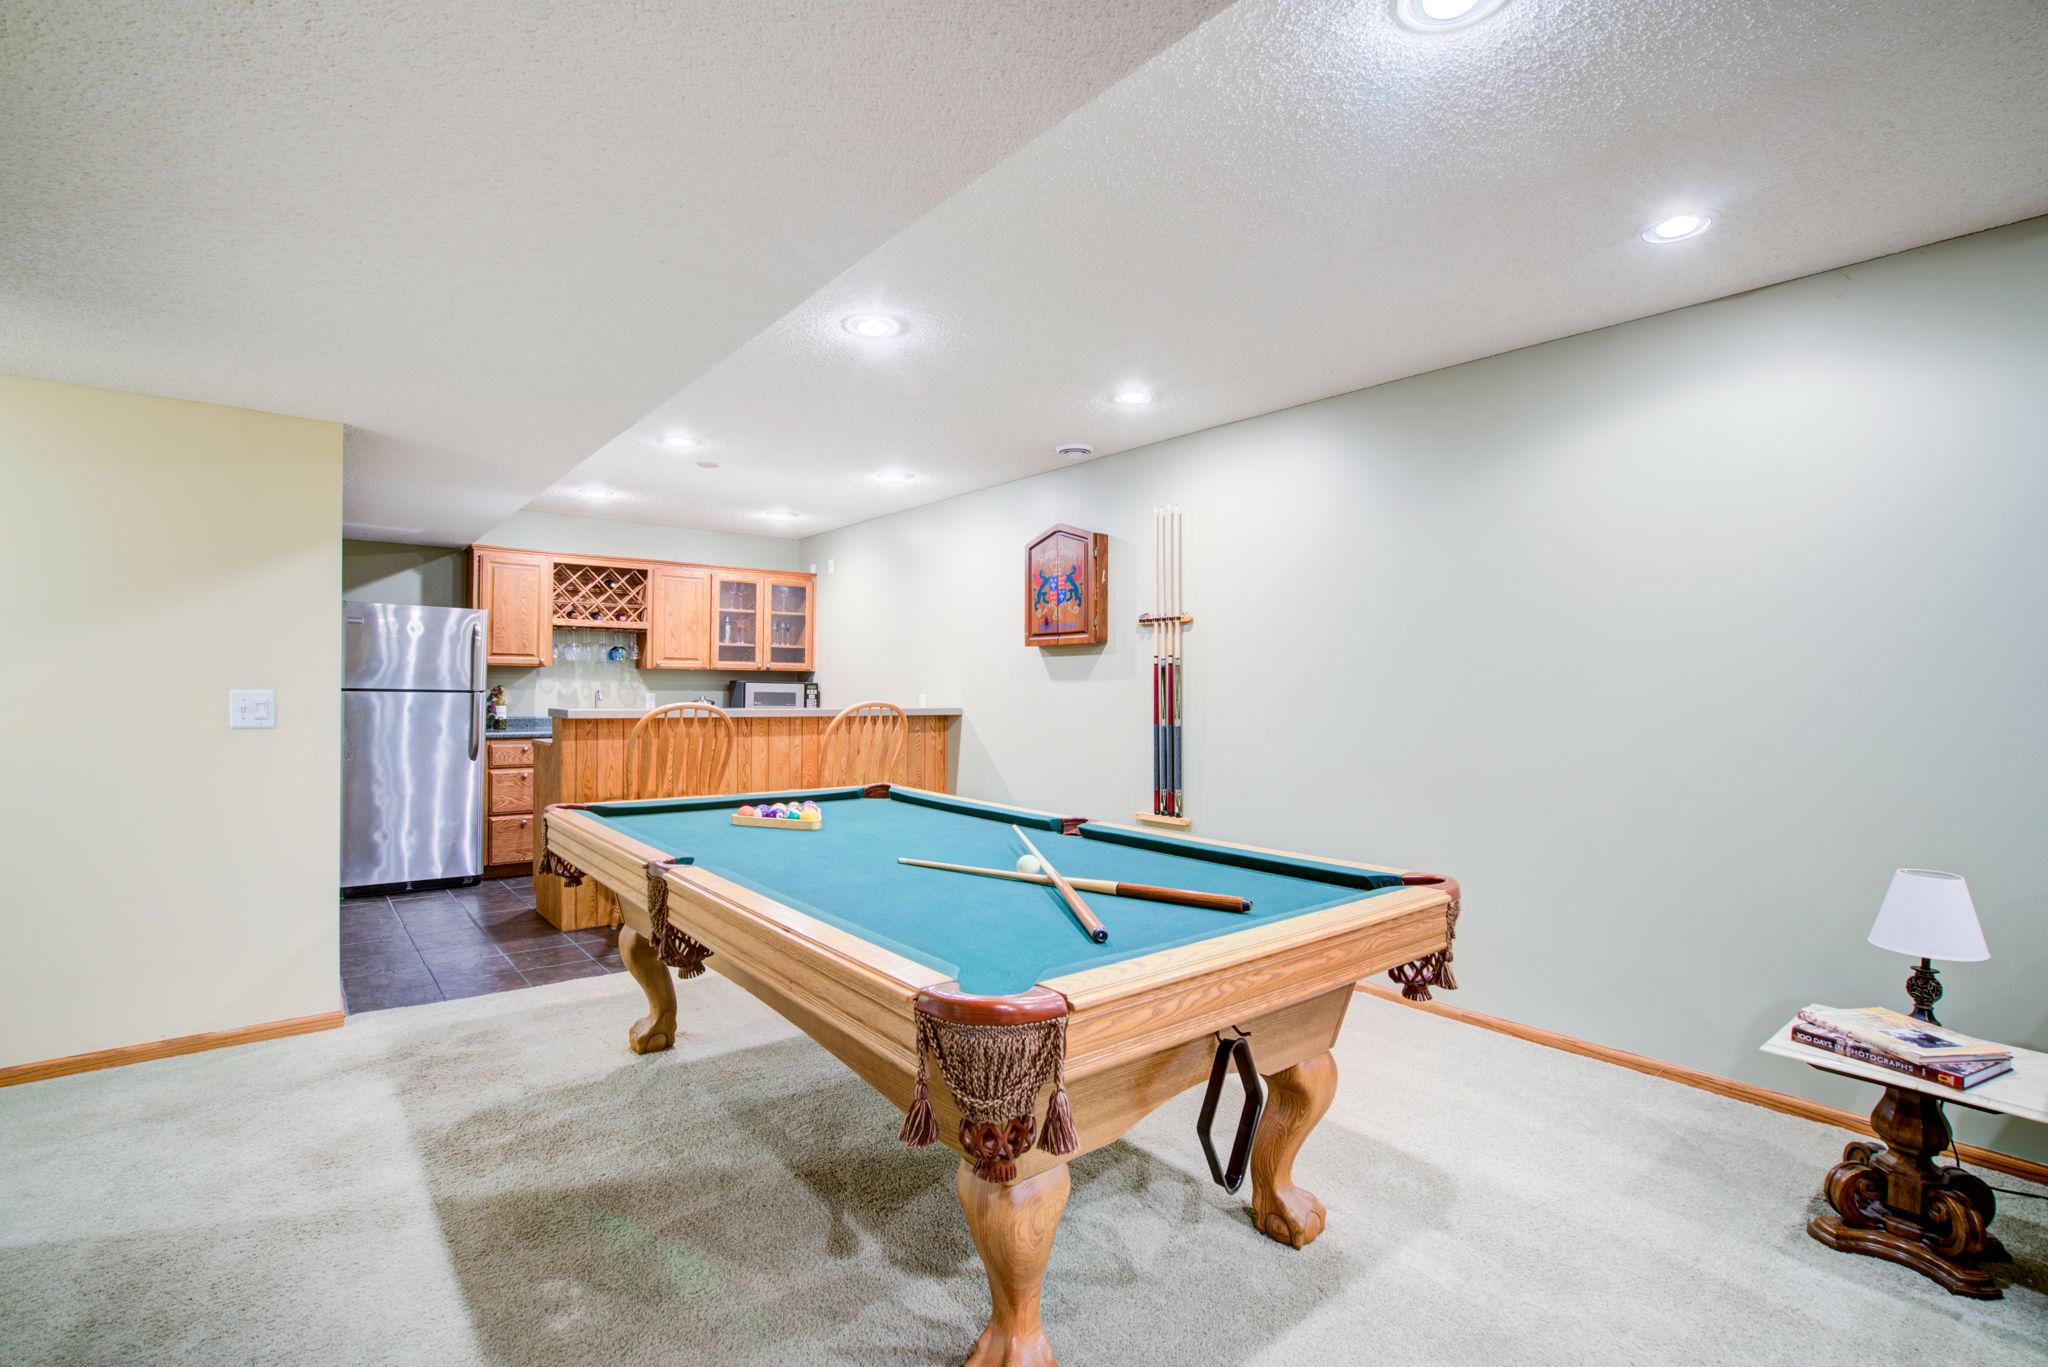 Pool Room/Wet Bar